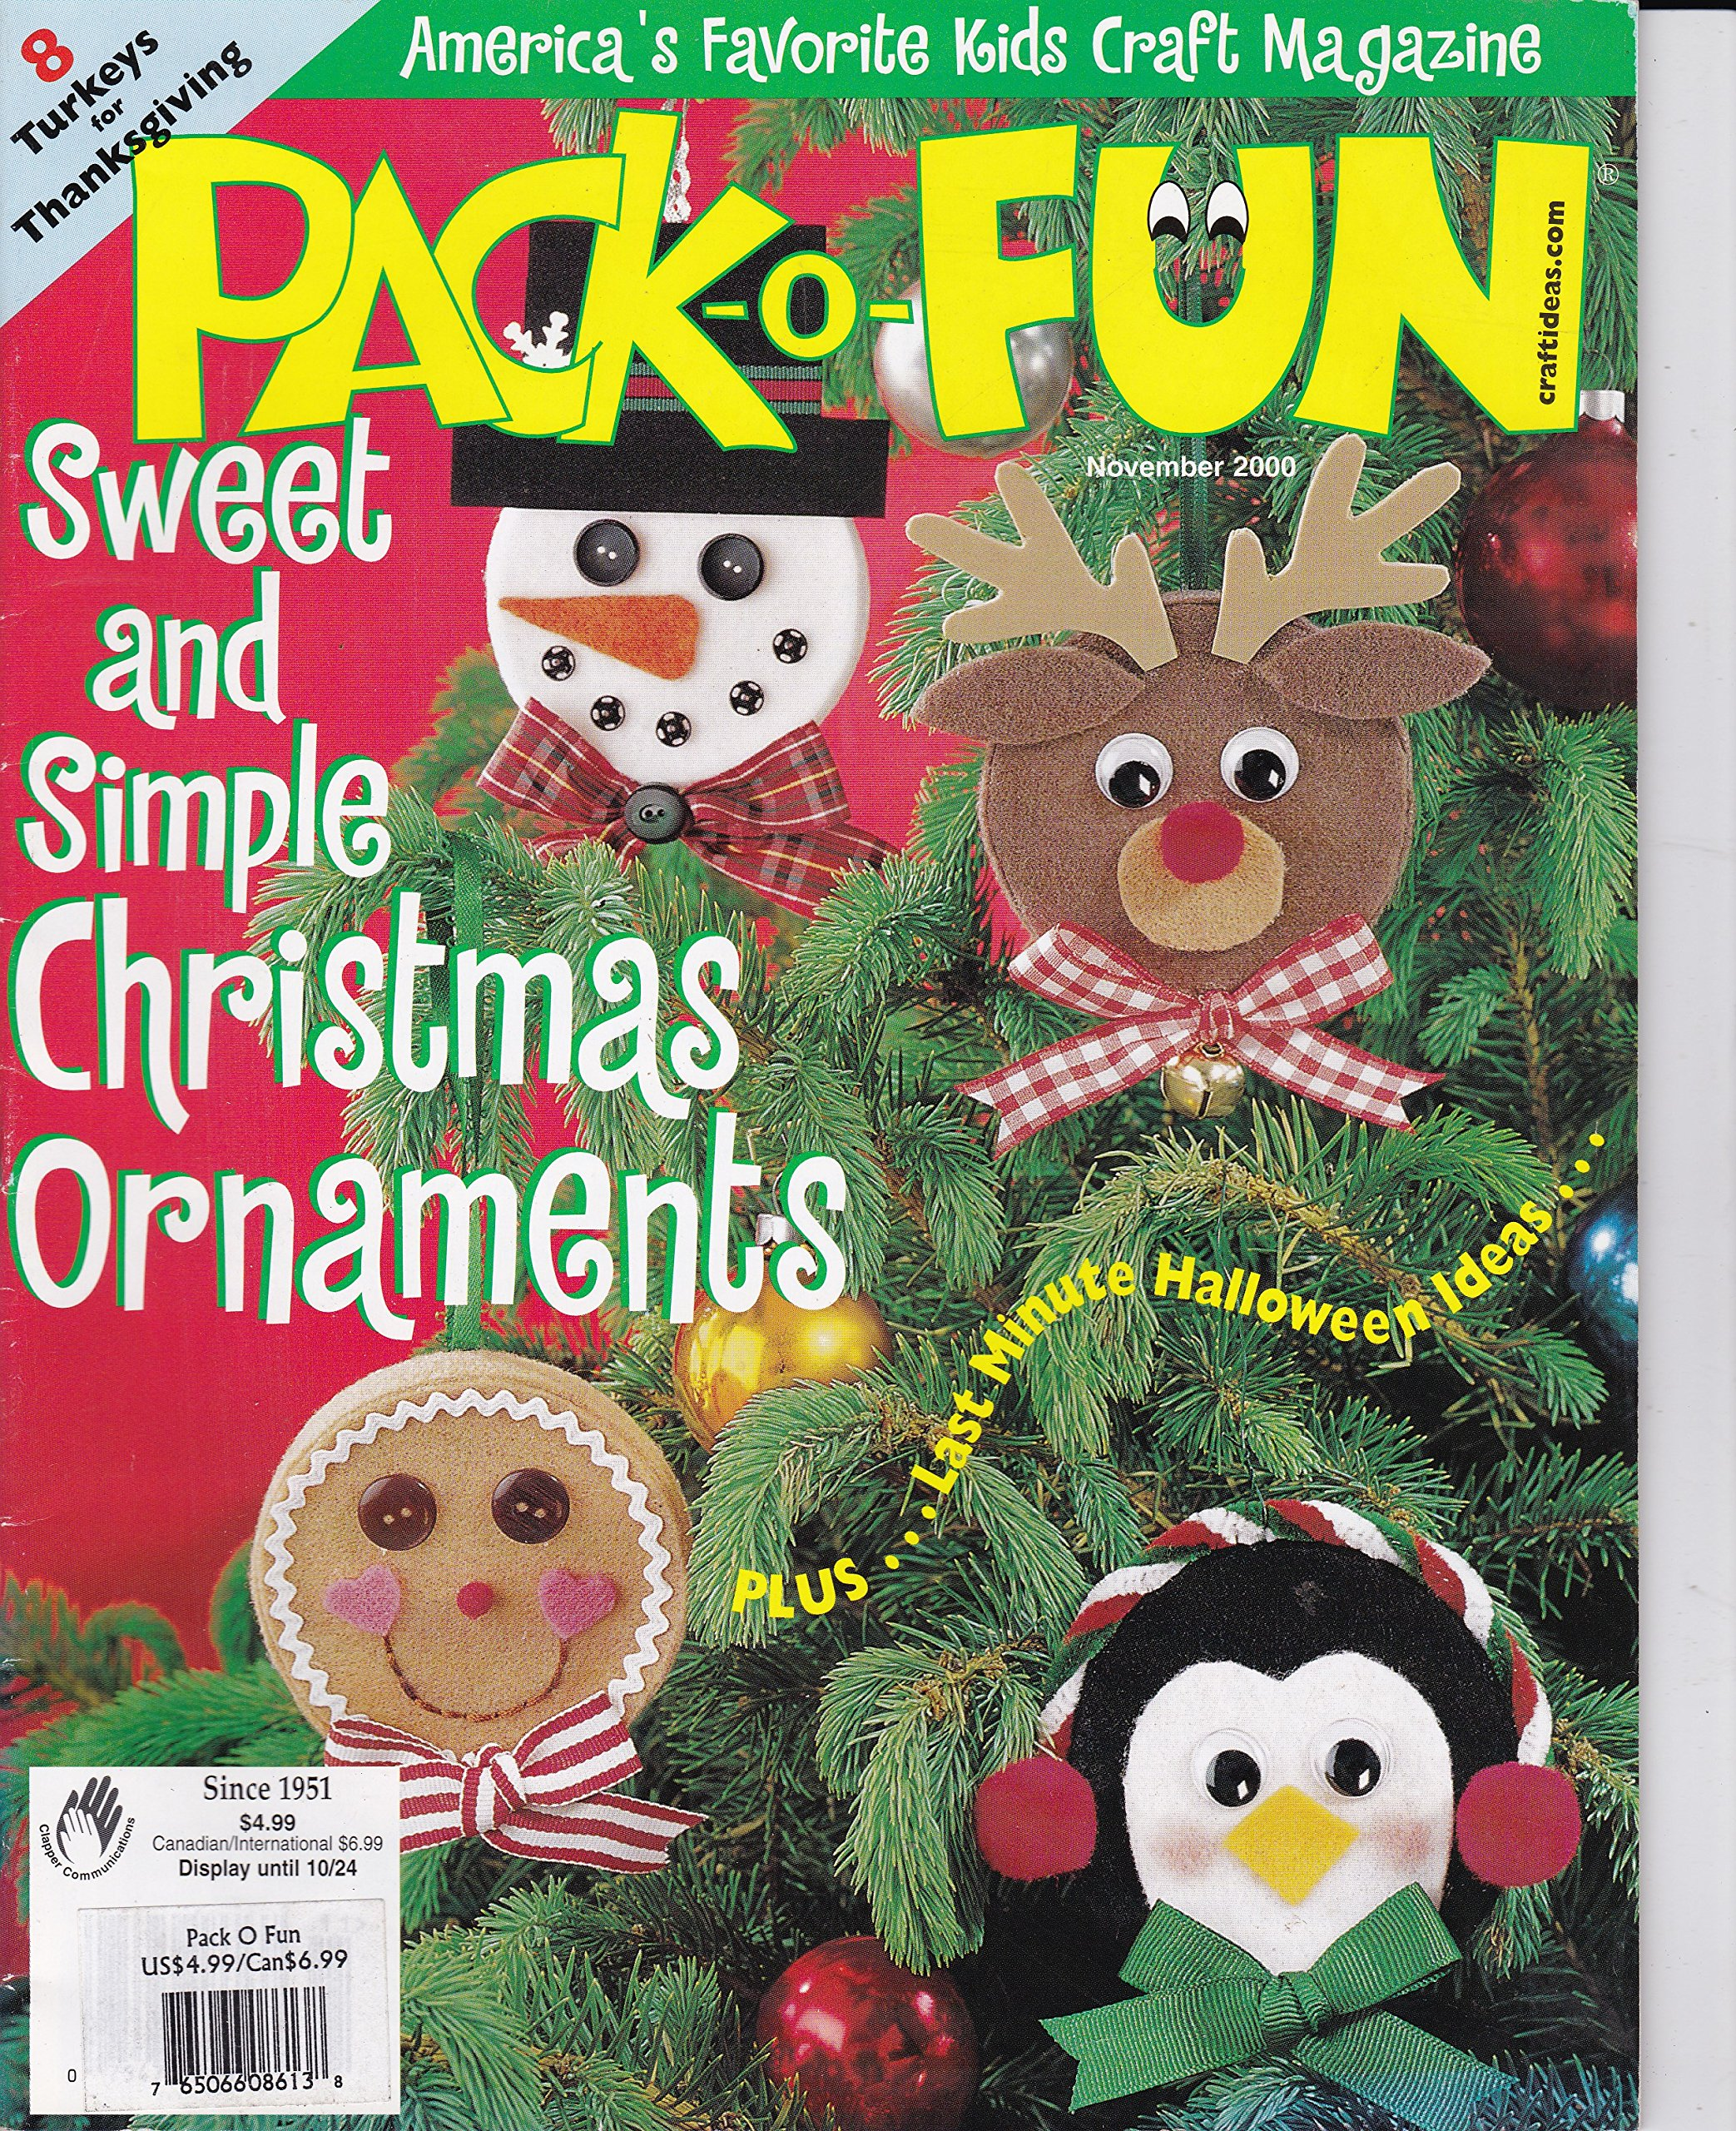 Pack O Fun America S Favorite Kids Craft Magazine November 2000 8